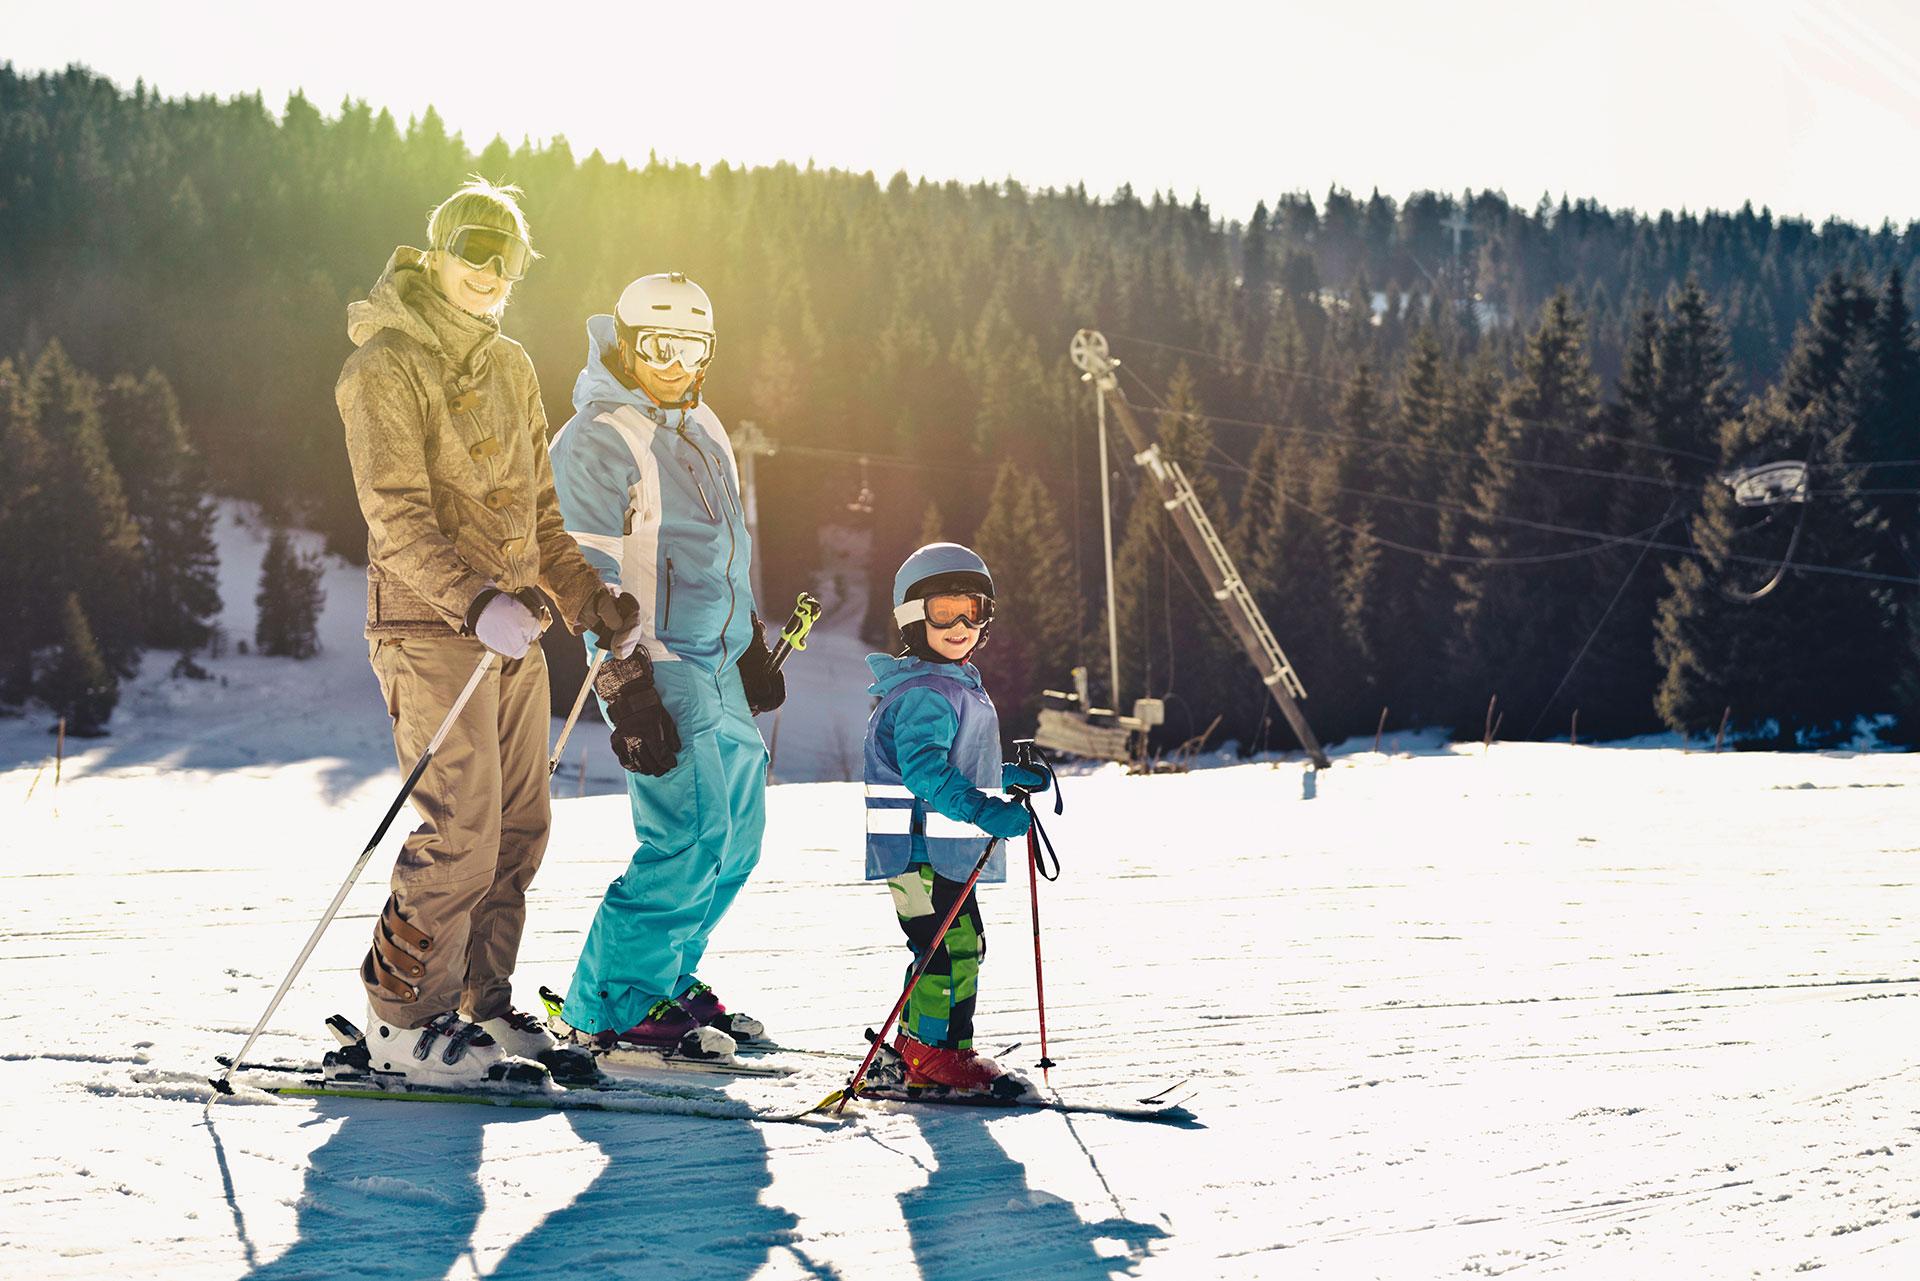 ski - famille - ski de fond - ski alpin - luge - snowboard